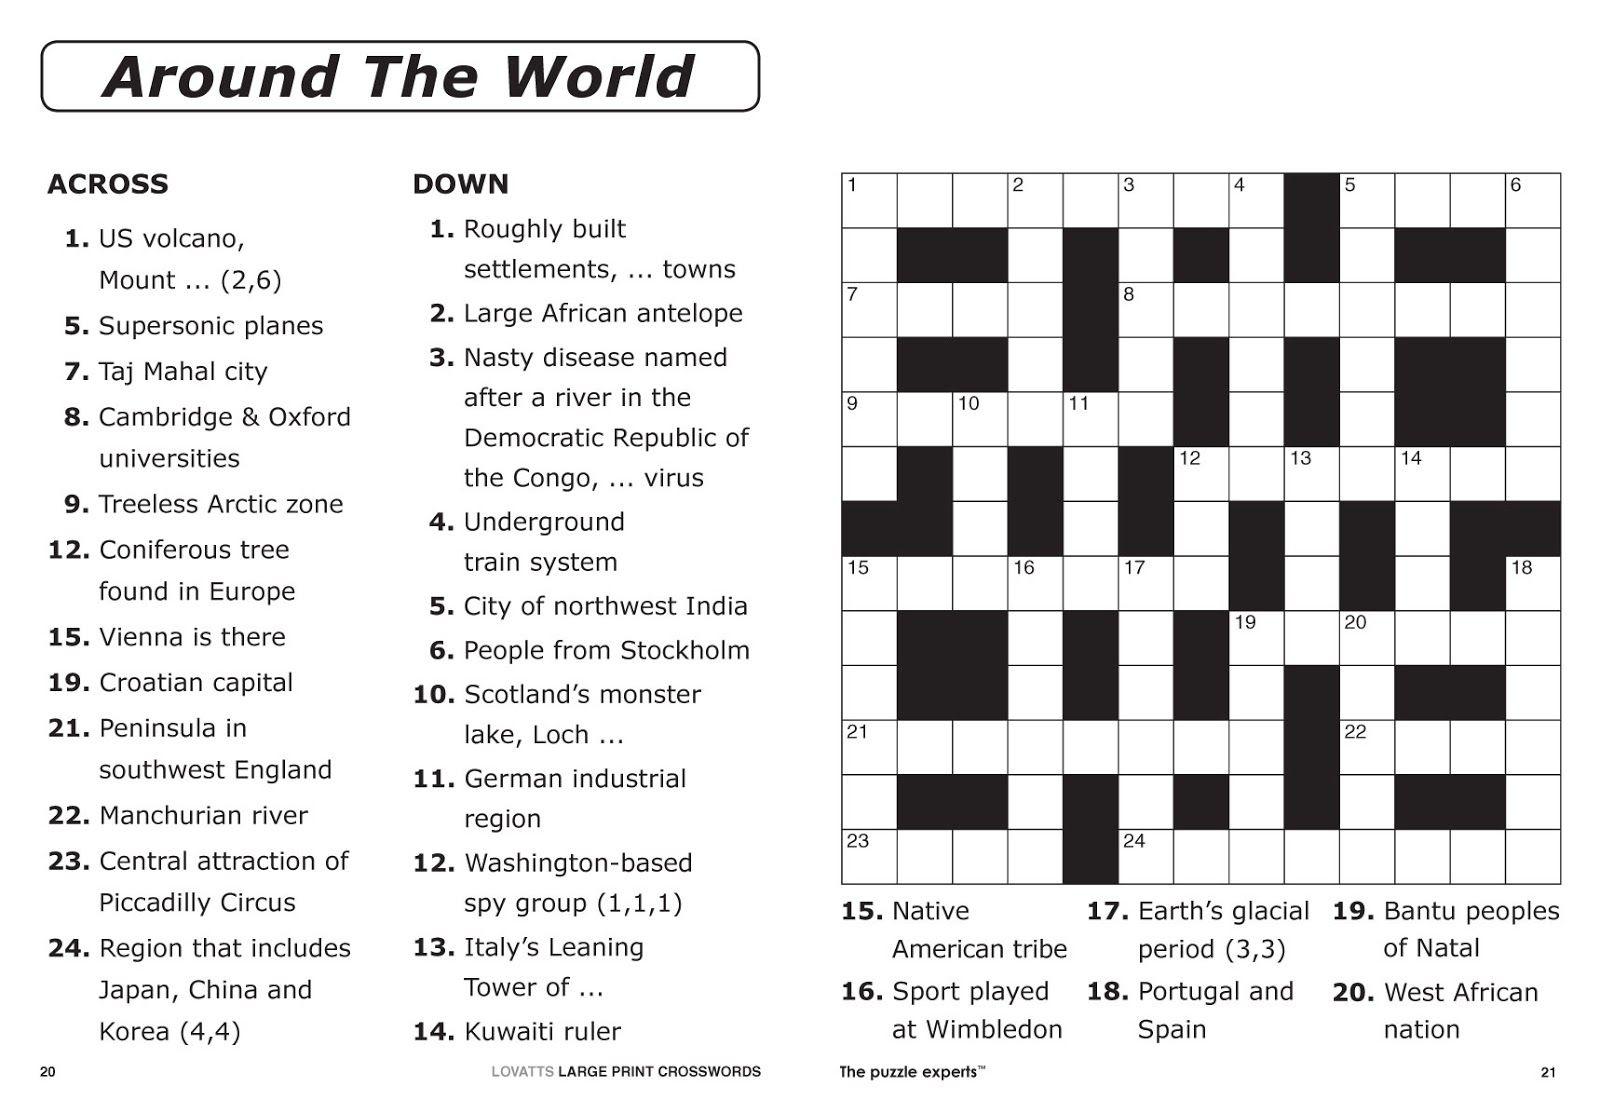 Free Printable Large Print Crossword Puzzles | M3U8 - Printable Puzzles In Spanish